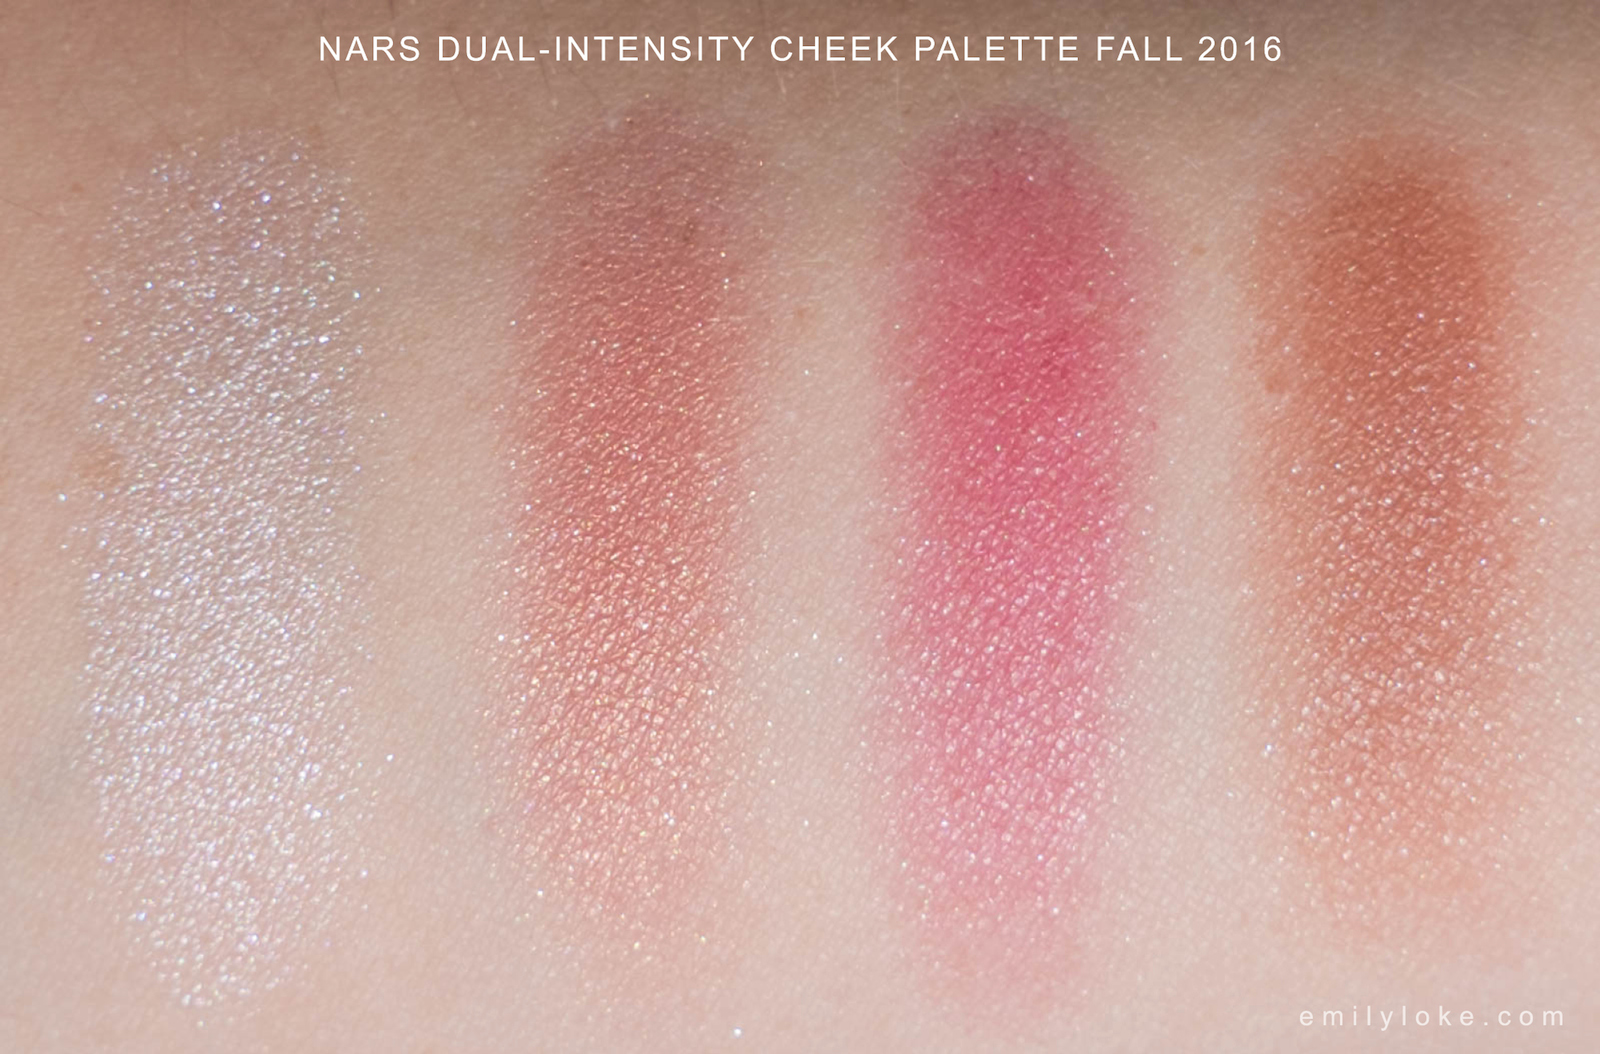 NARS Dual Intensity Cheek Palette